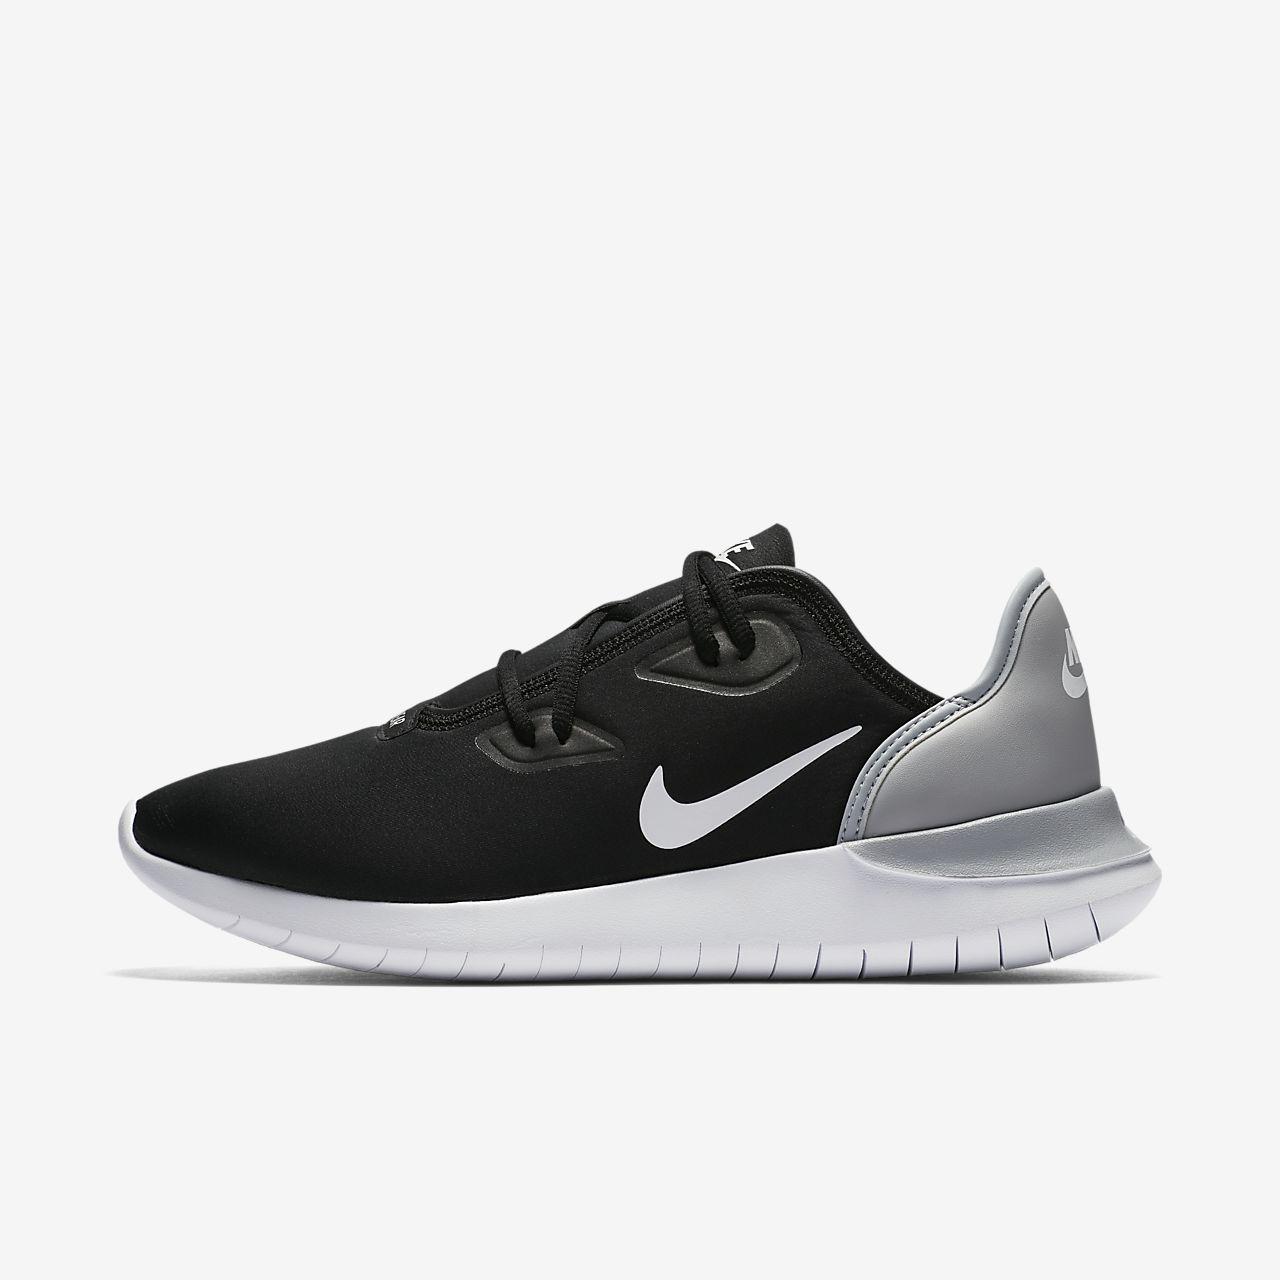 Nike Womens hakata Low Top Lace Up Running Sneaker Black white Size 7.5